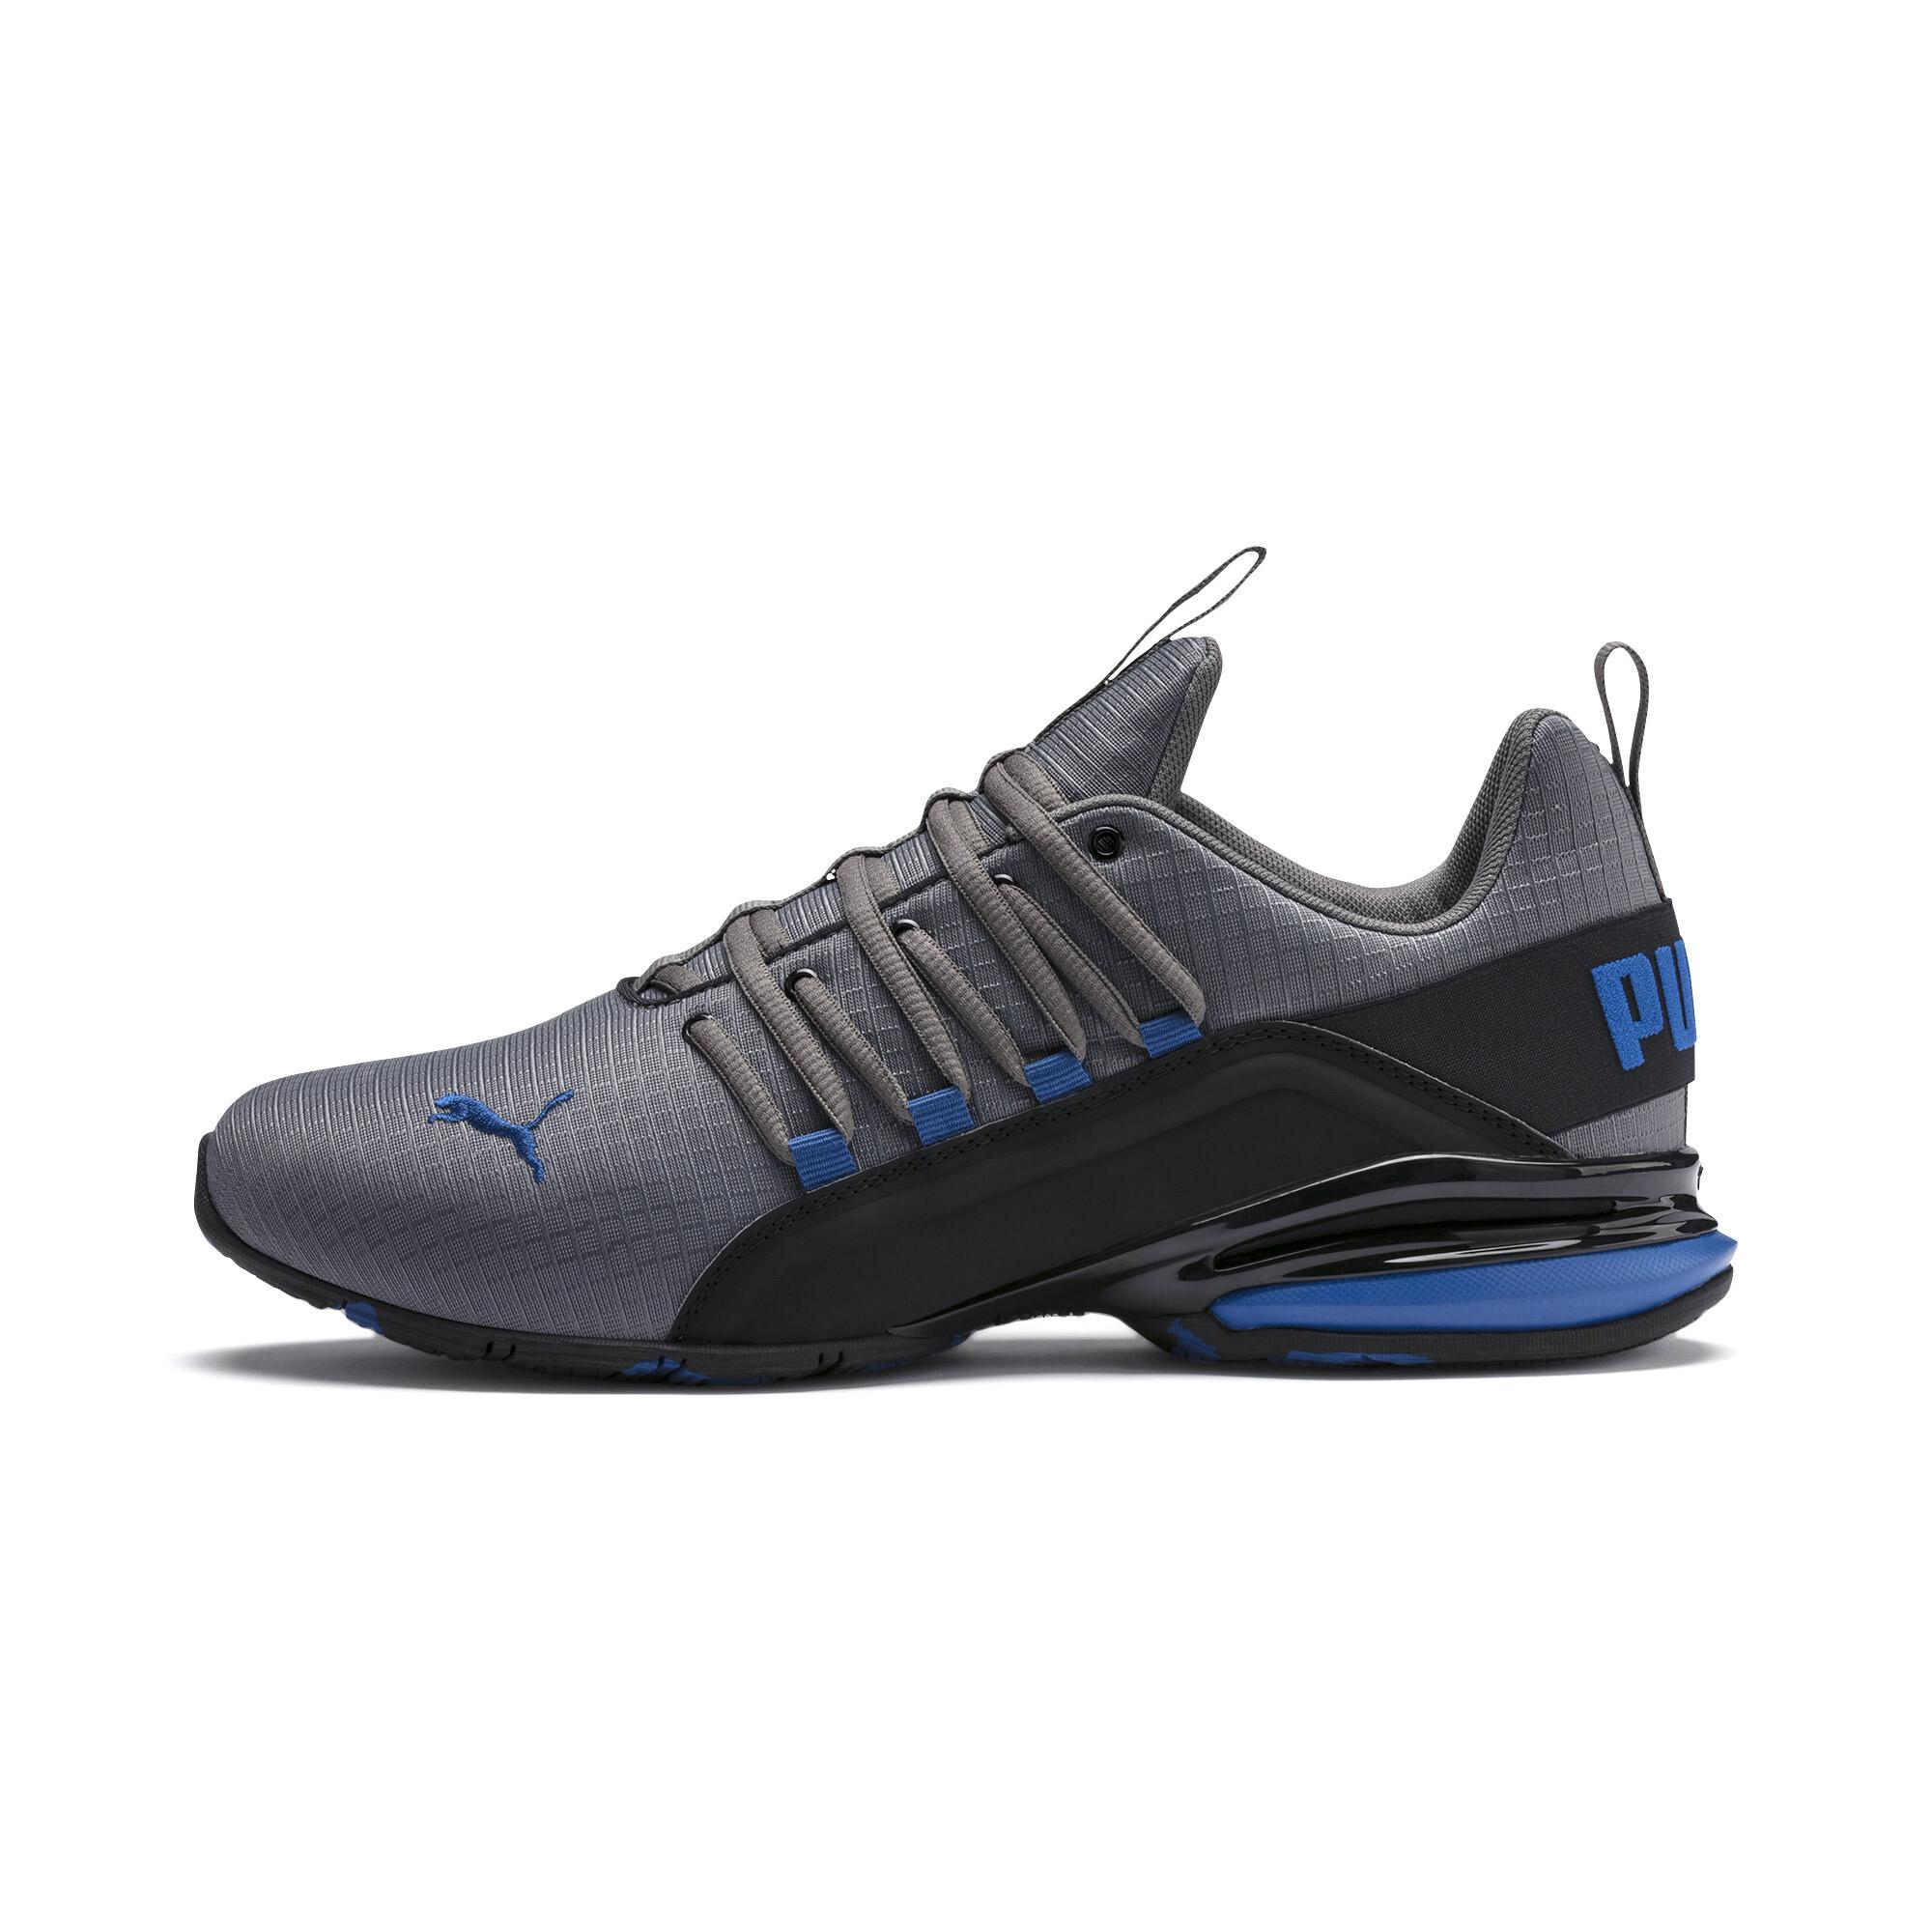 PUMA-Men-039-s-Axelion-Rip-Training-Shoes thumbnail 18